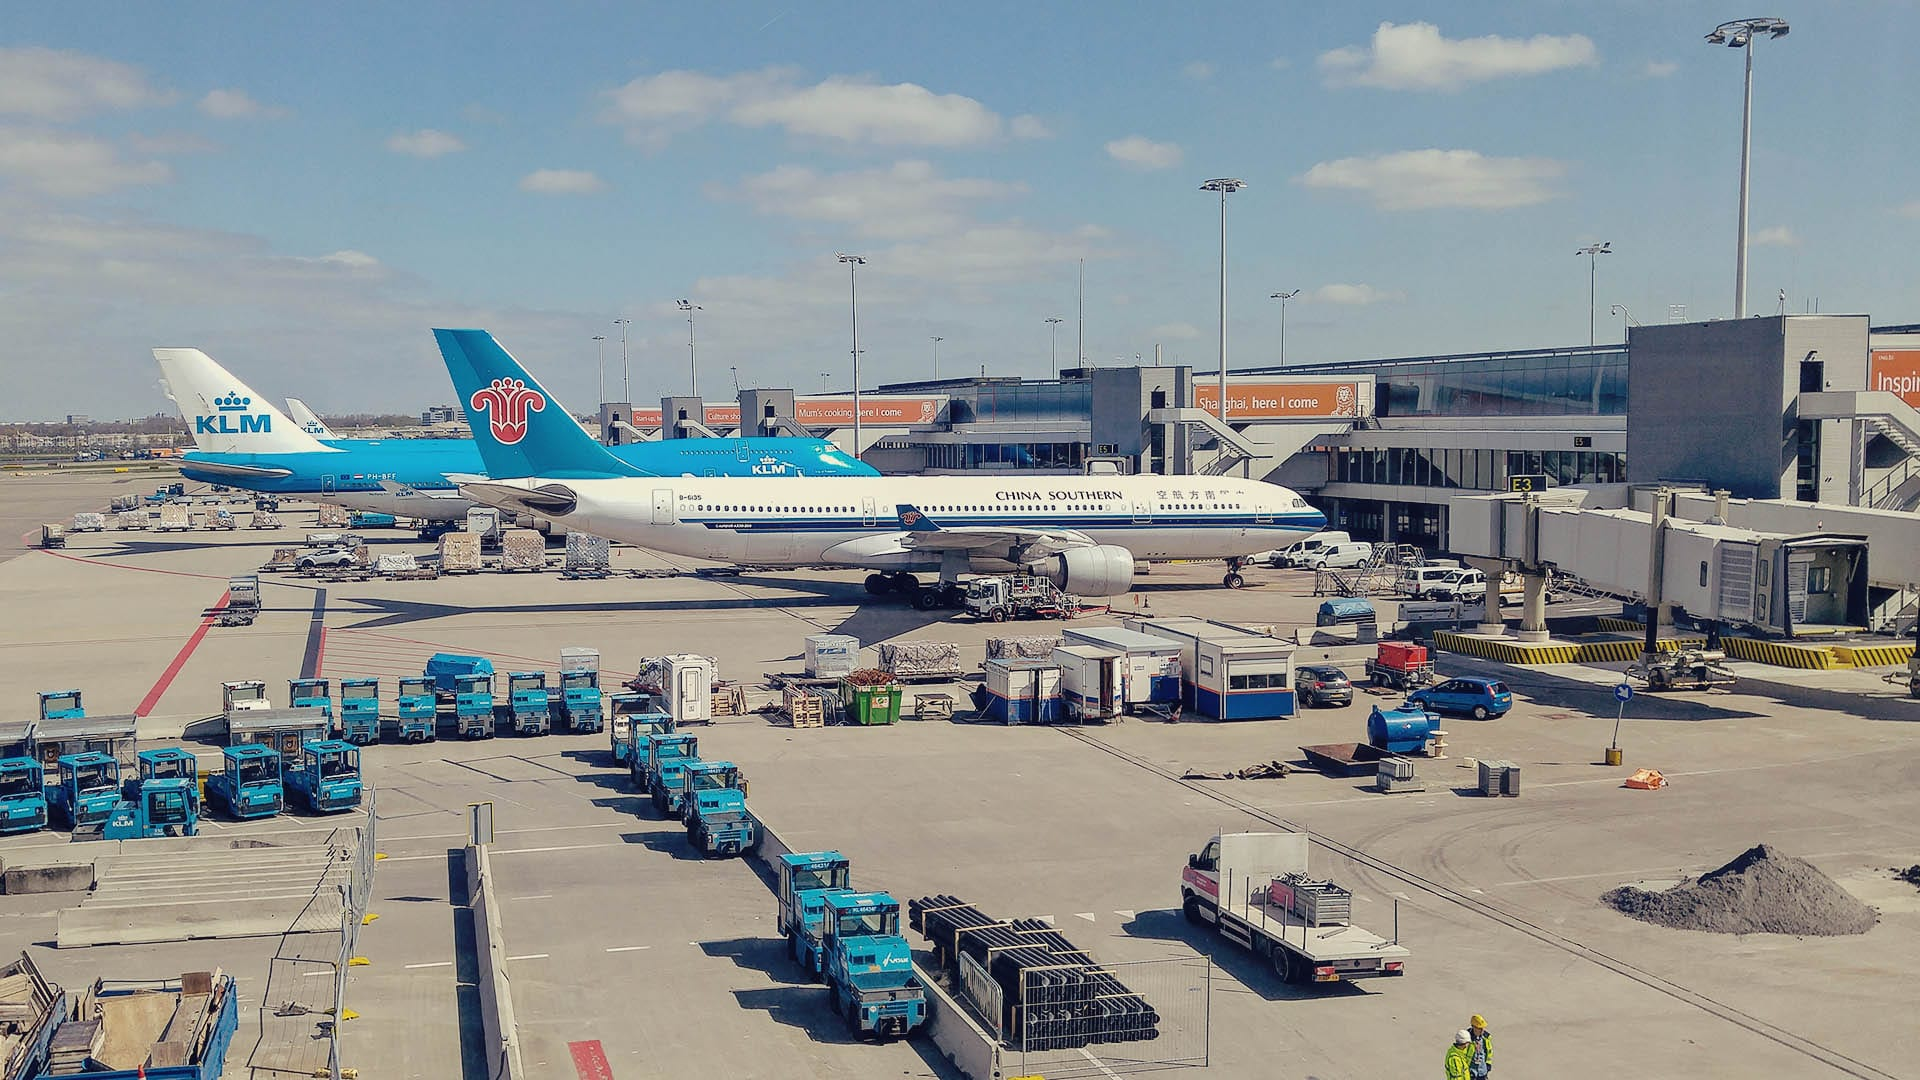 Aeroporto Internacional de Amsterdã Schiphol